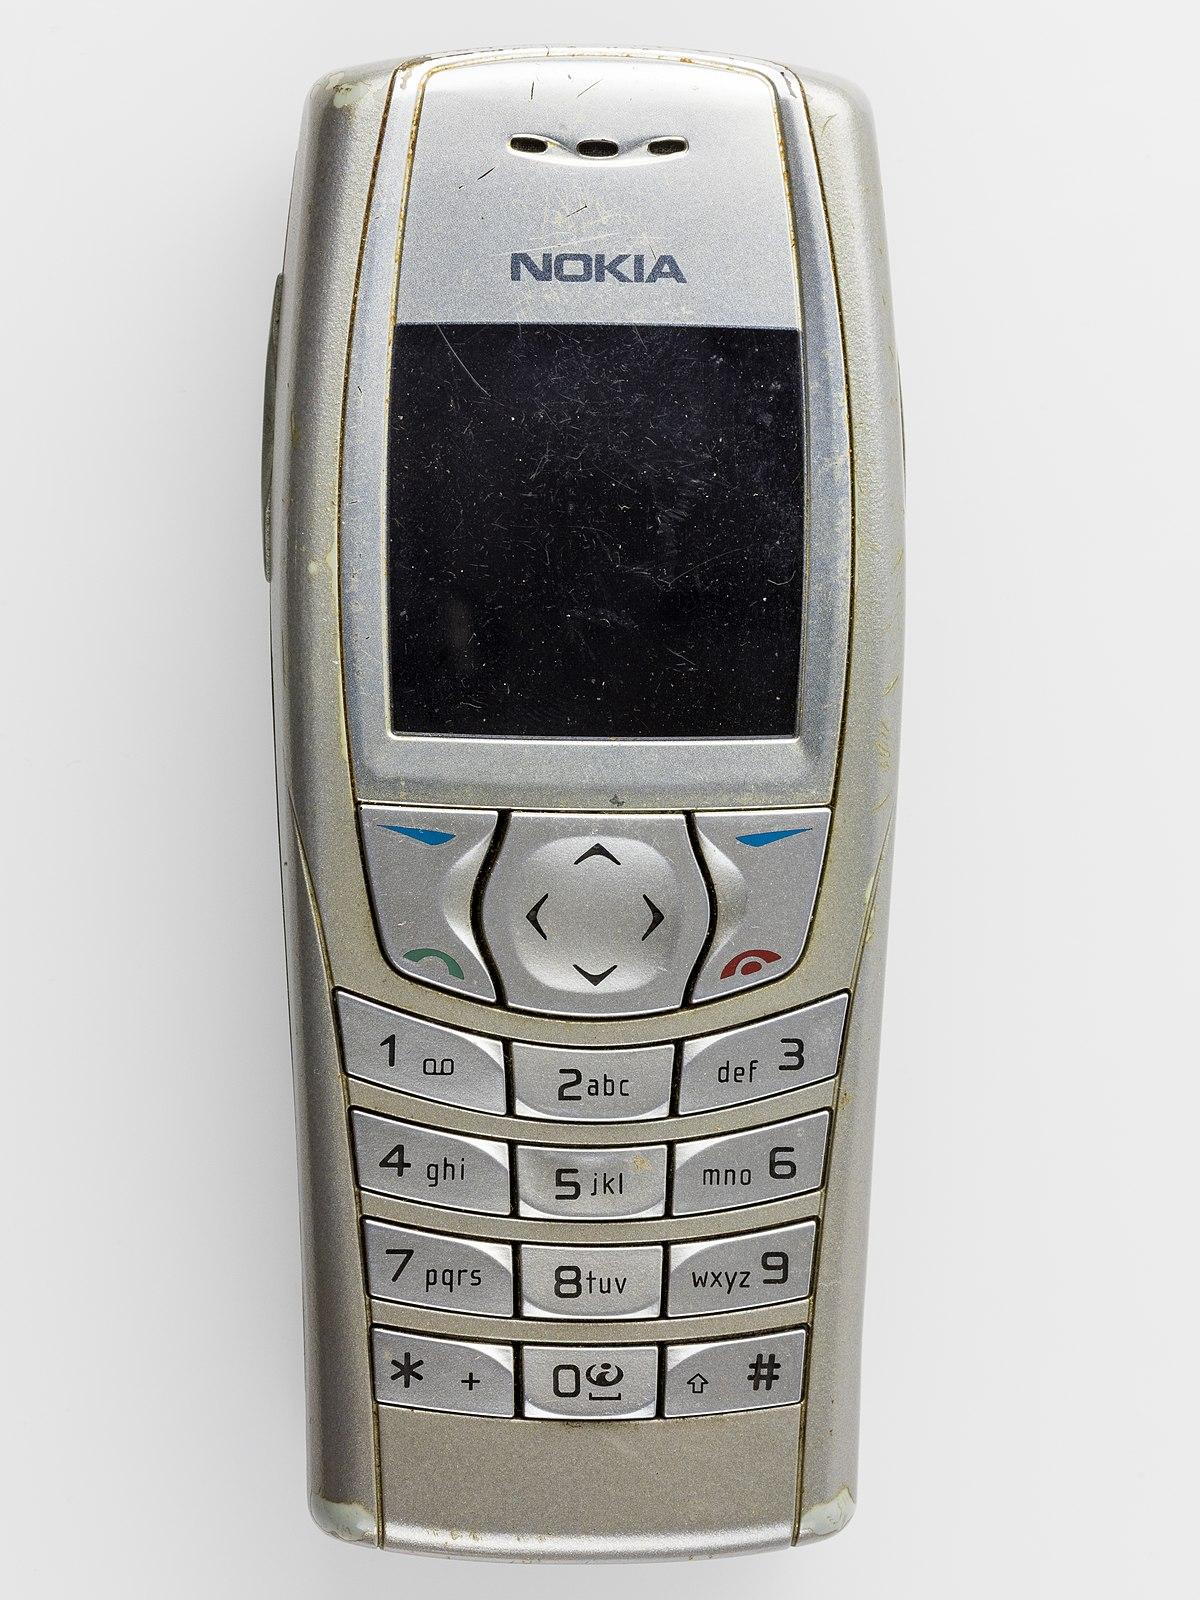 Nokia 6610 - Wikipedia, wolna encyklopedia